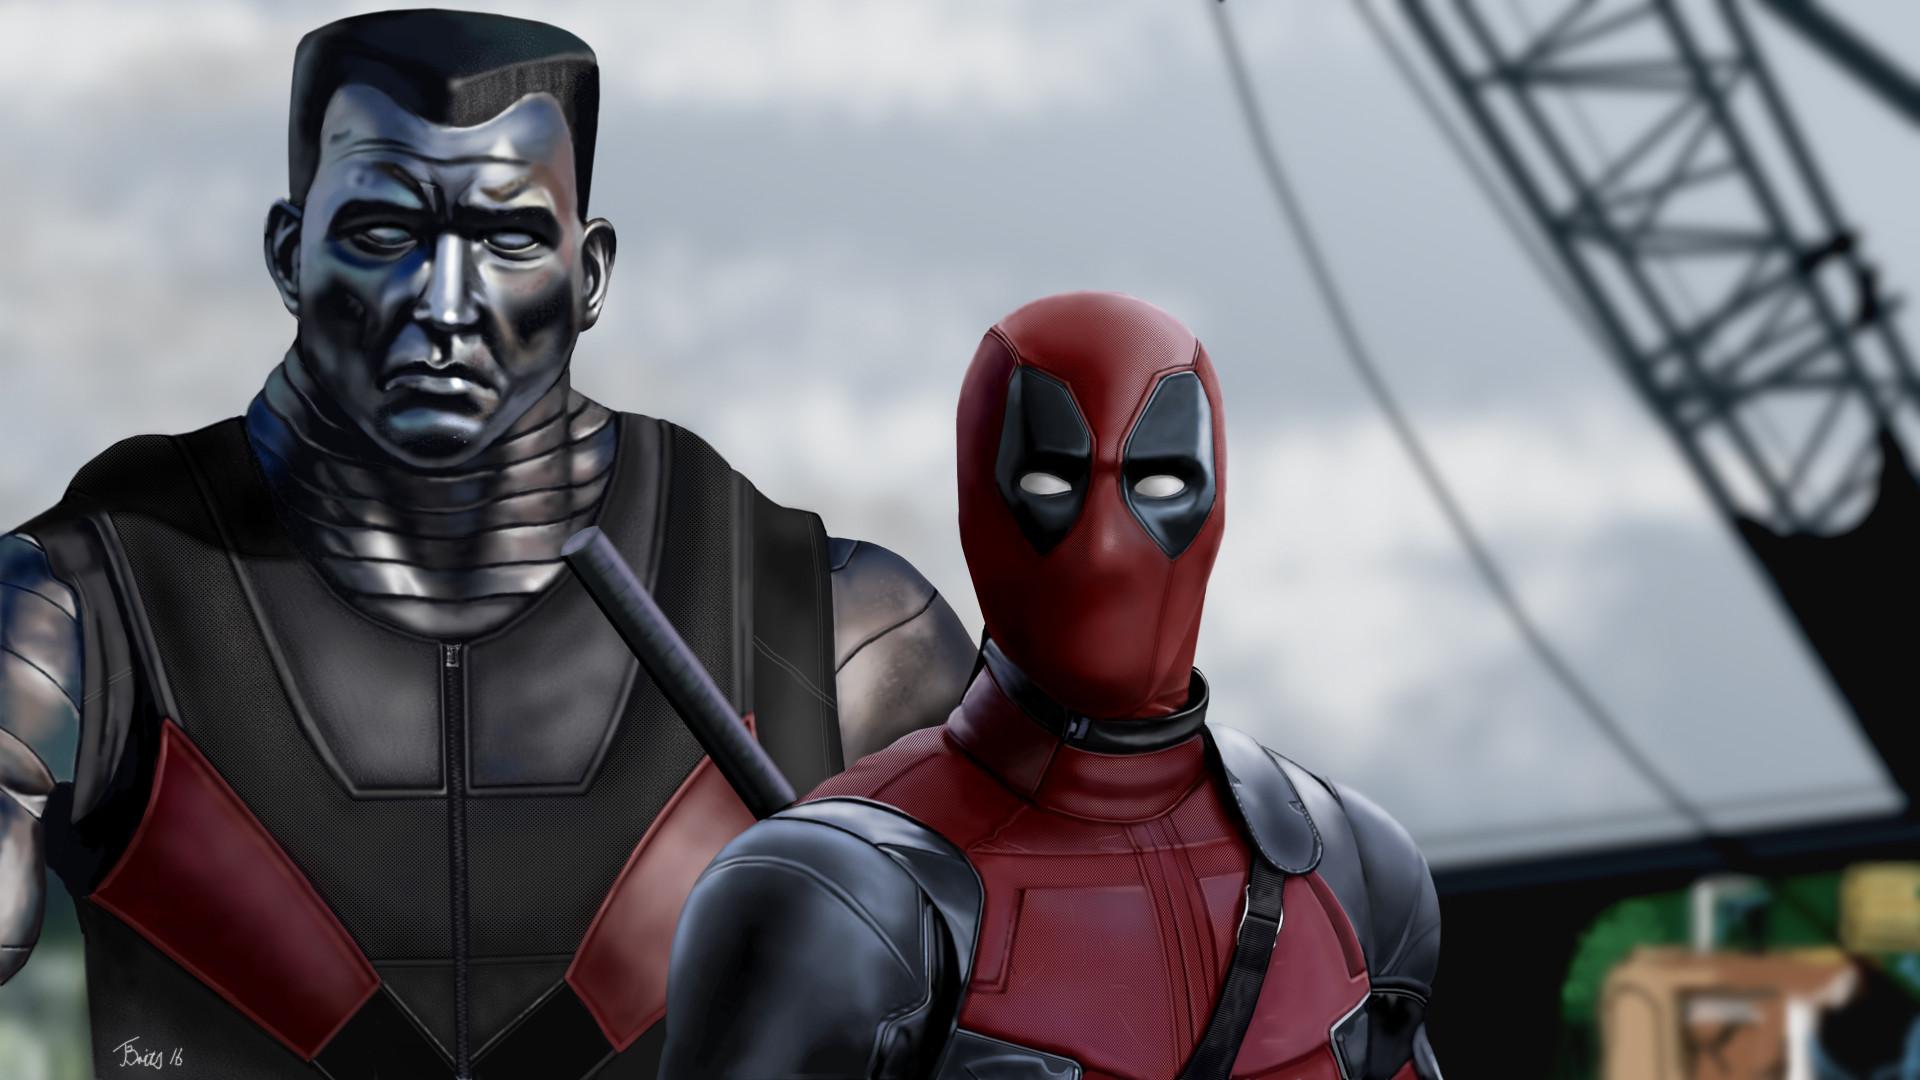 Deadpool & Colossus